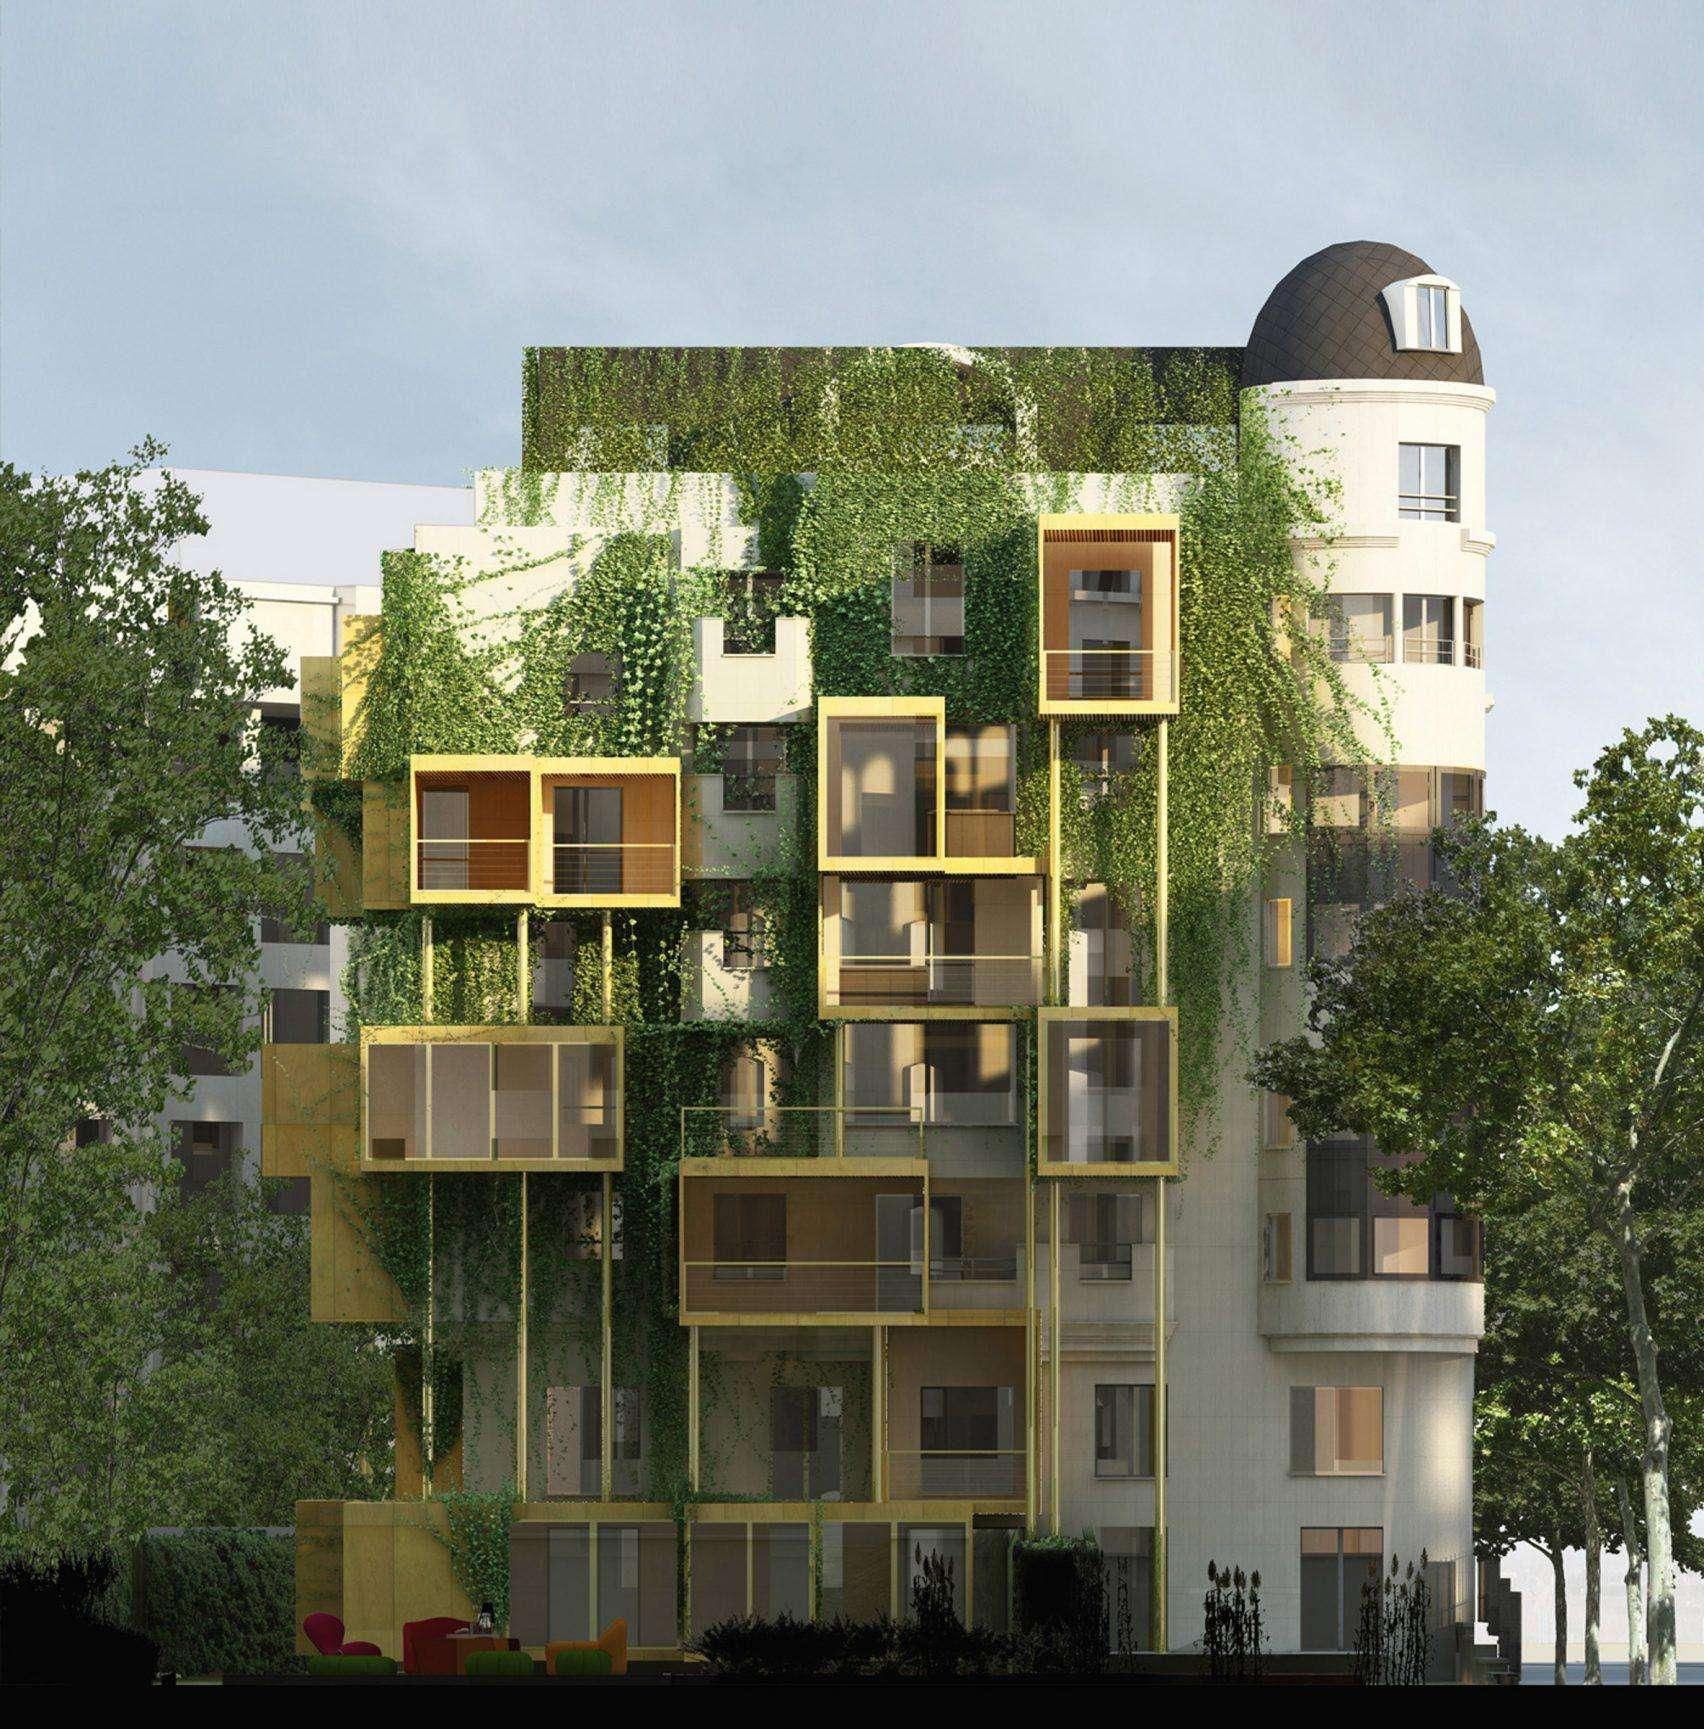 video-malka-architecture-stephane-malka-plug-in-city-75-parasitic-architecture-modular-extensions-paris-movie_dezeen_2364_col_11-1704x1729